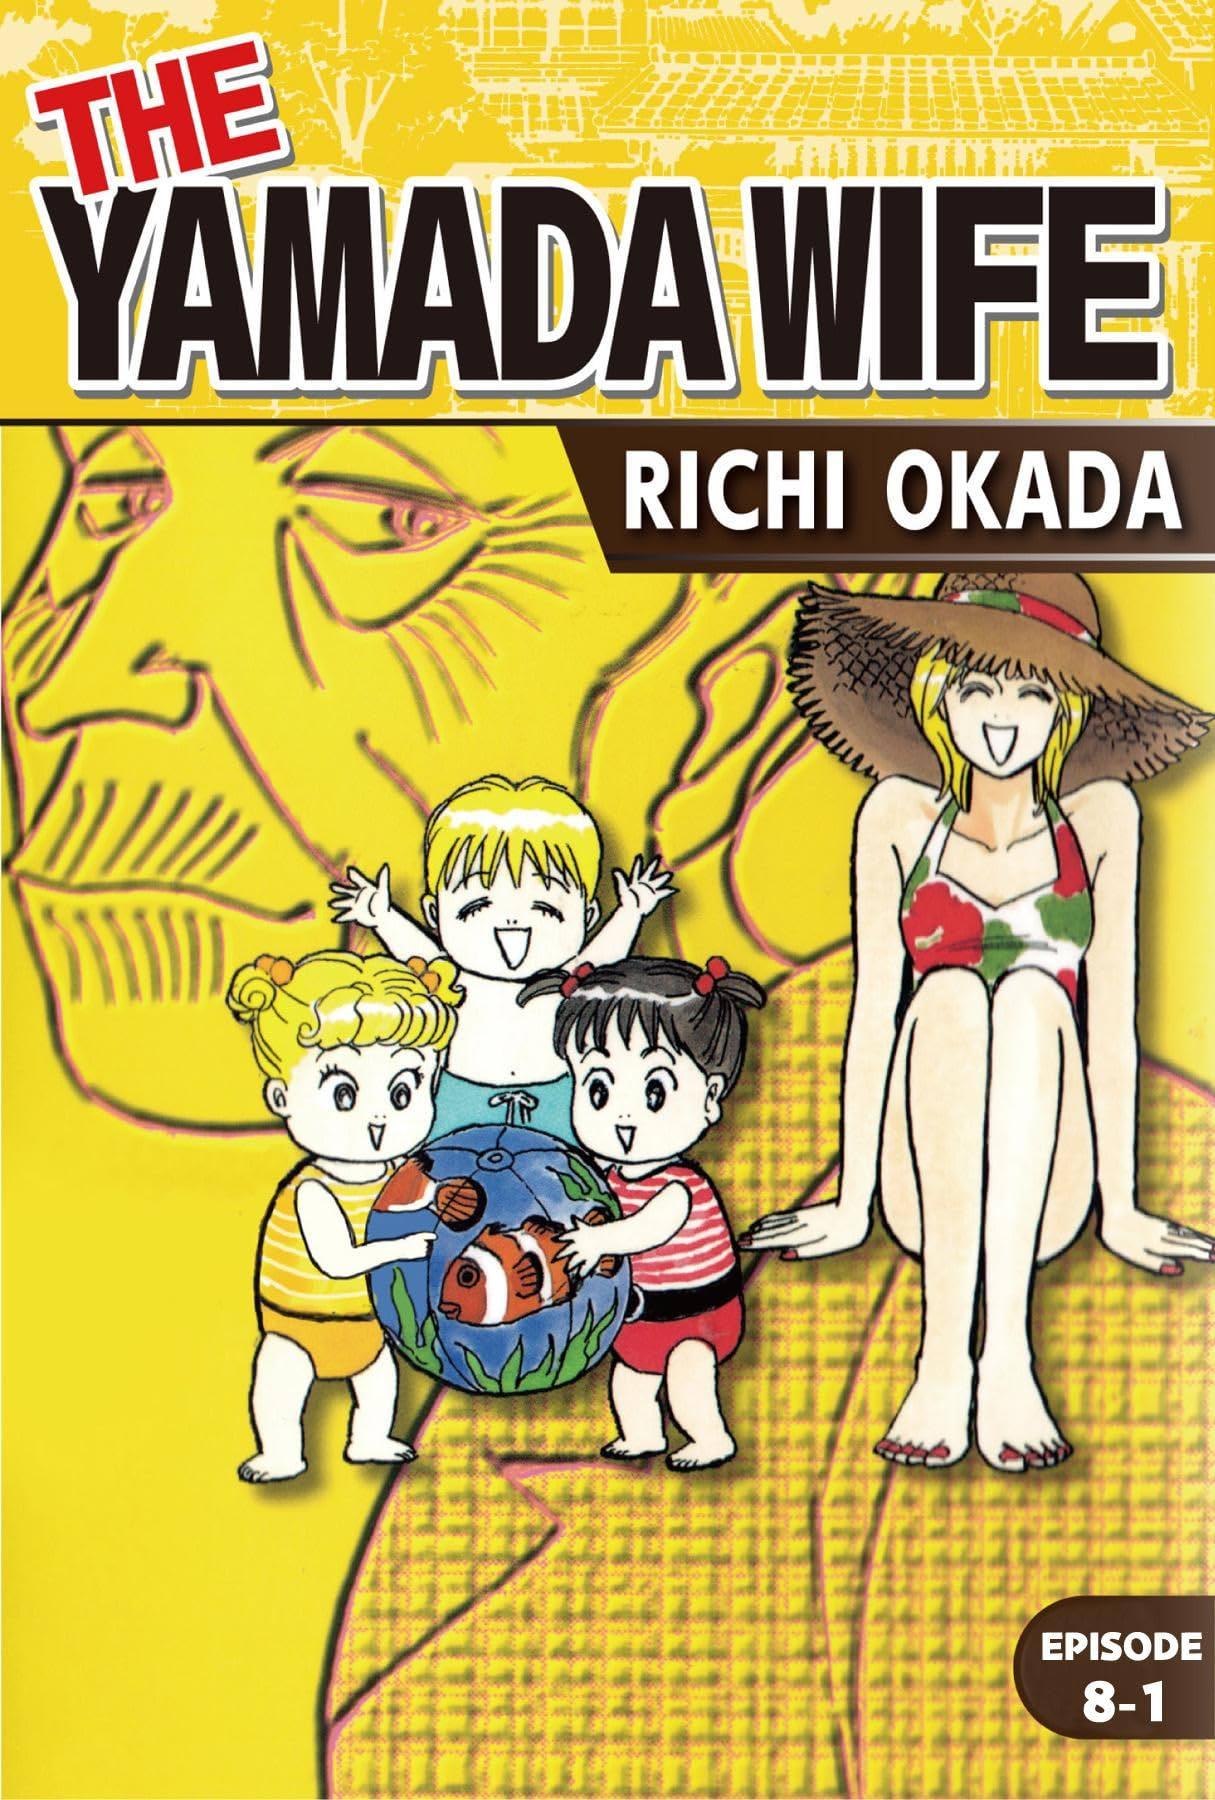 THE YAMADA WIFE #50